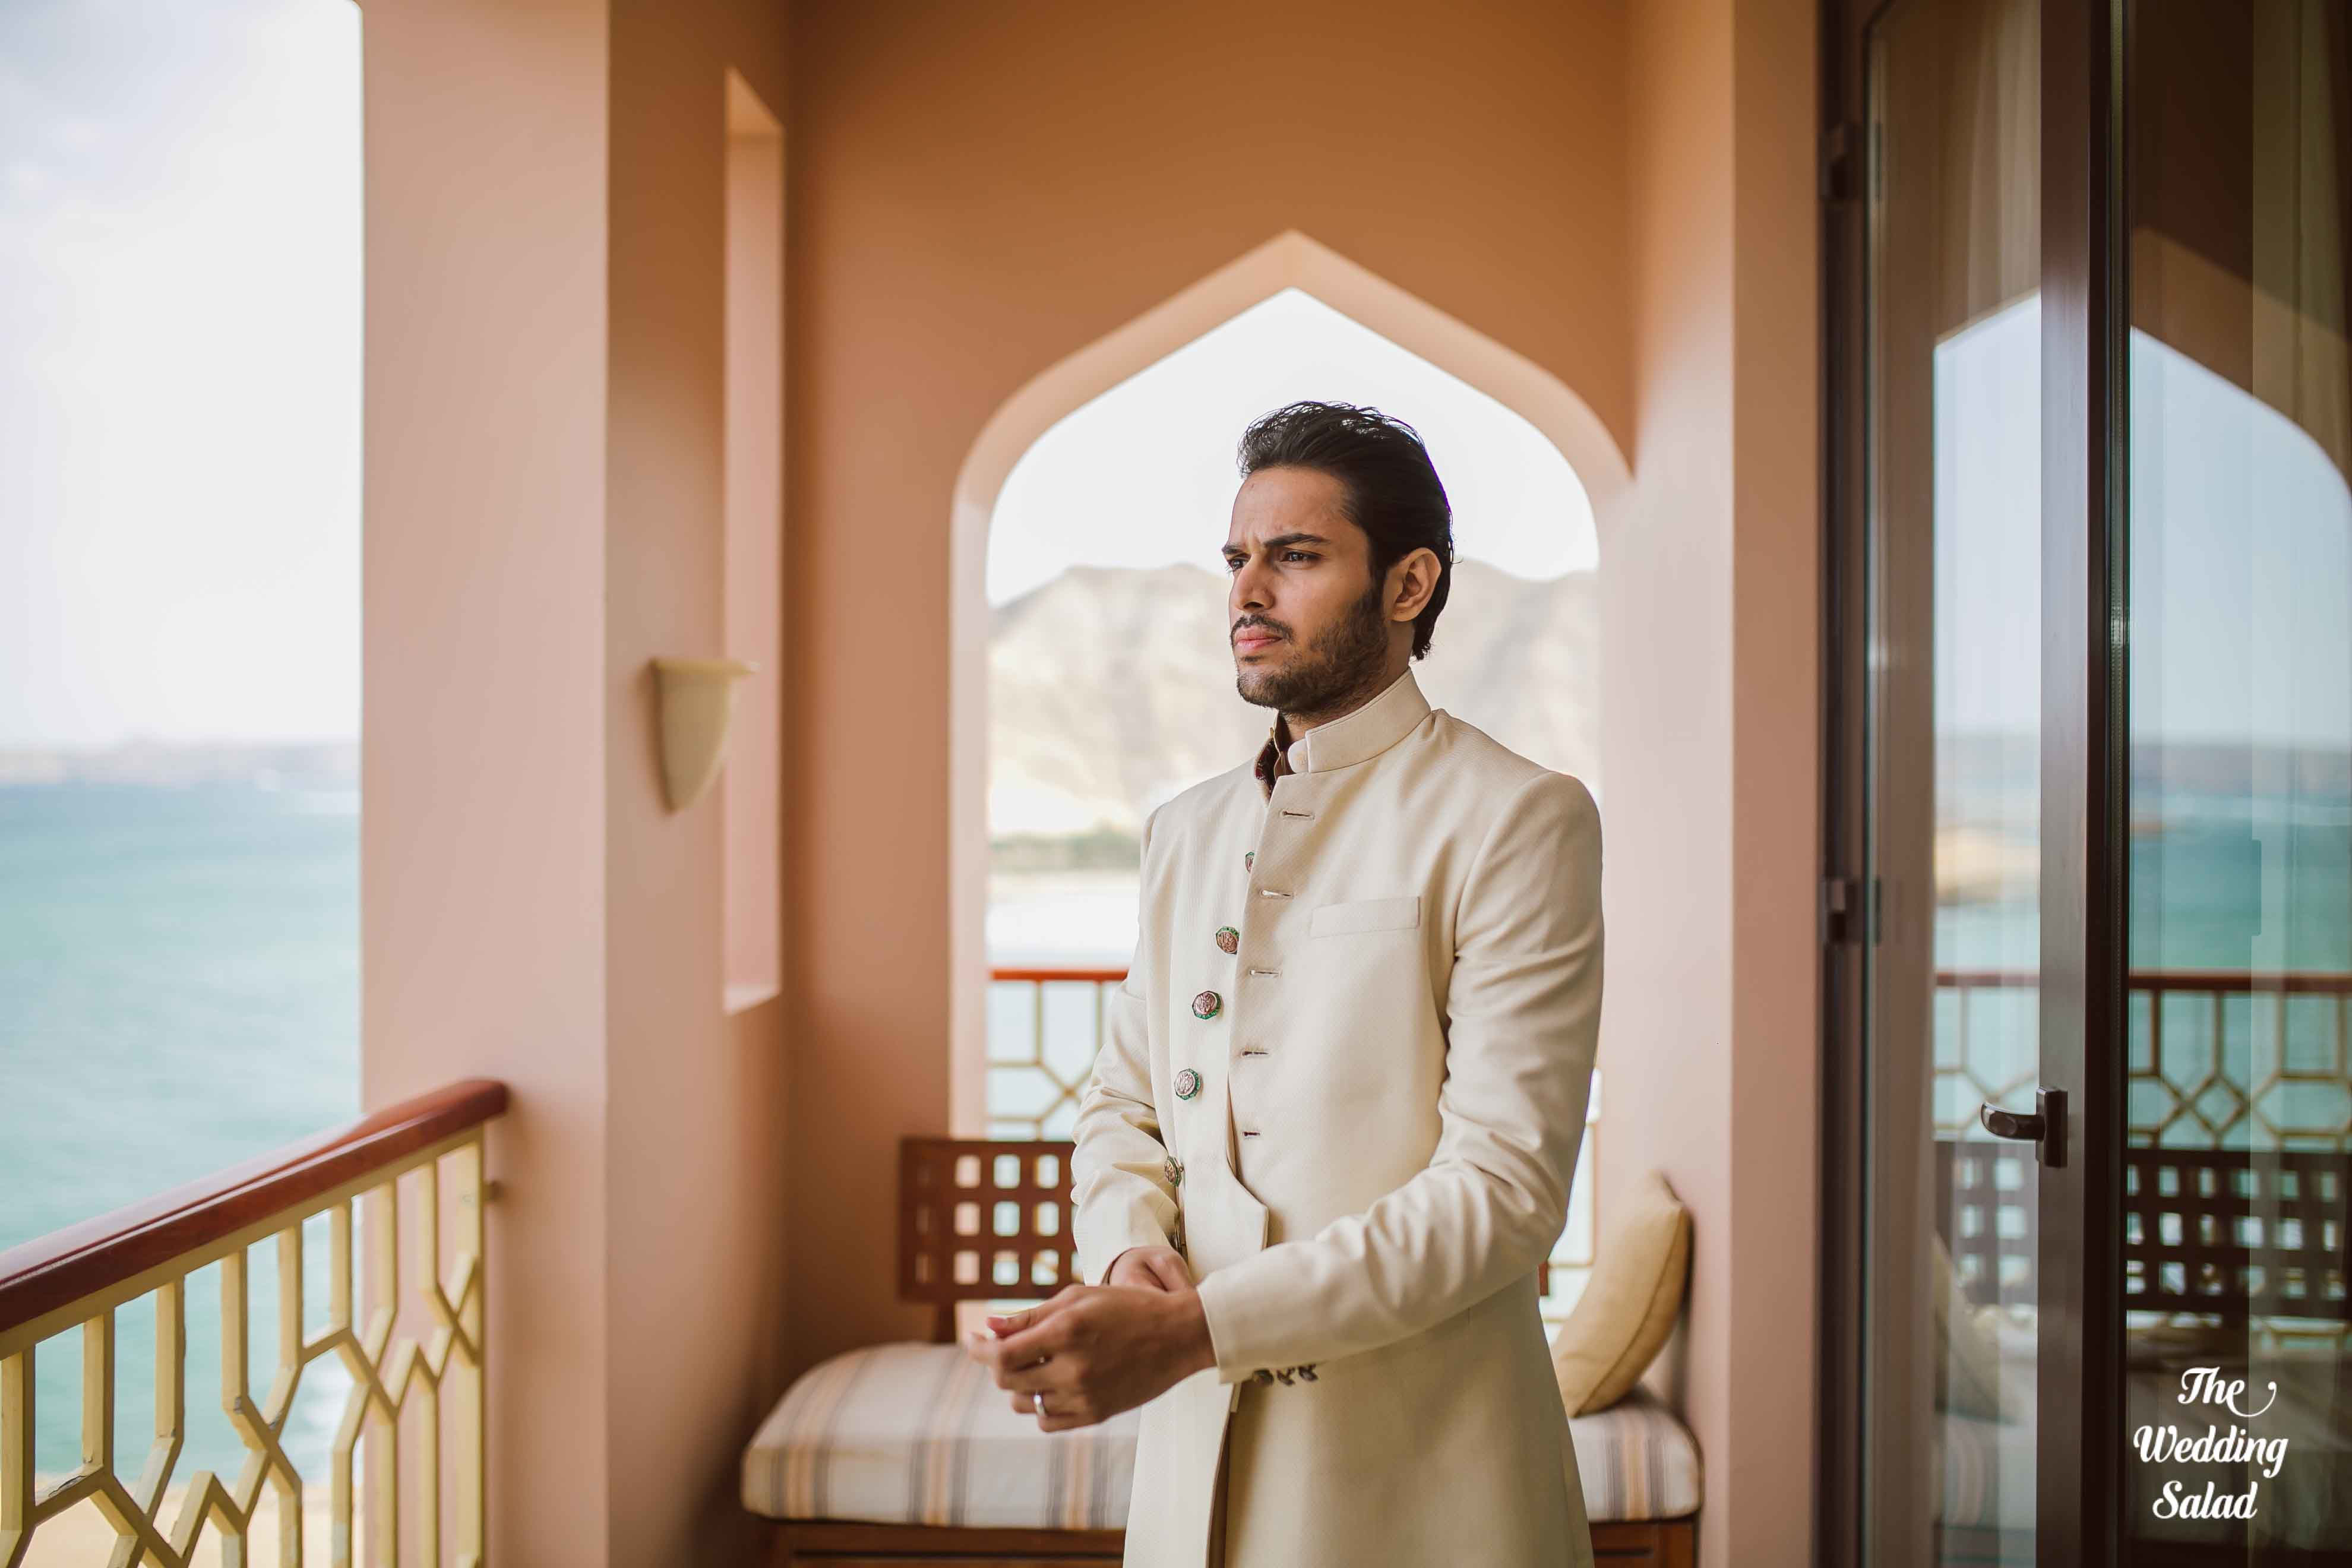 the dapper groom!:the wedding salad, manish malhotra, arpita mehta, sabyasachi couture pvt ltd